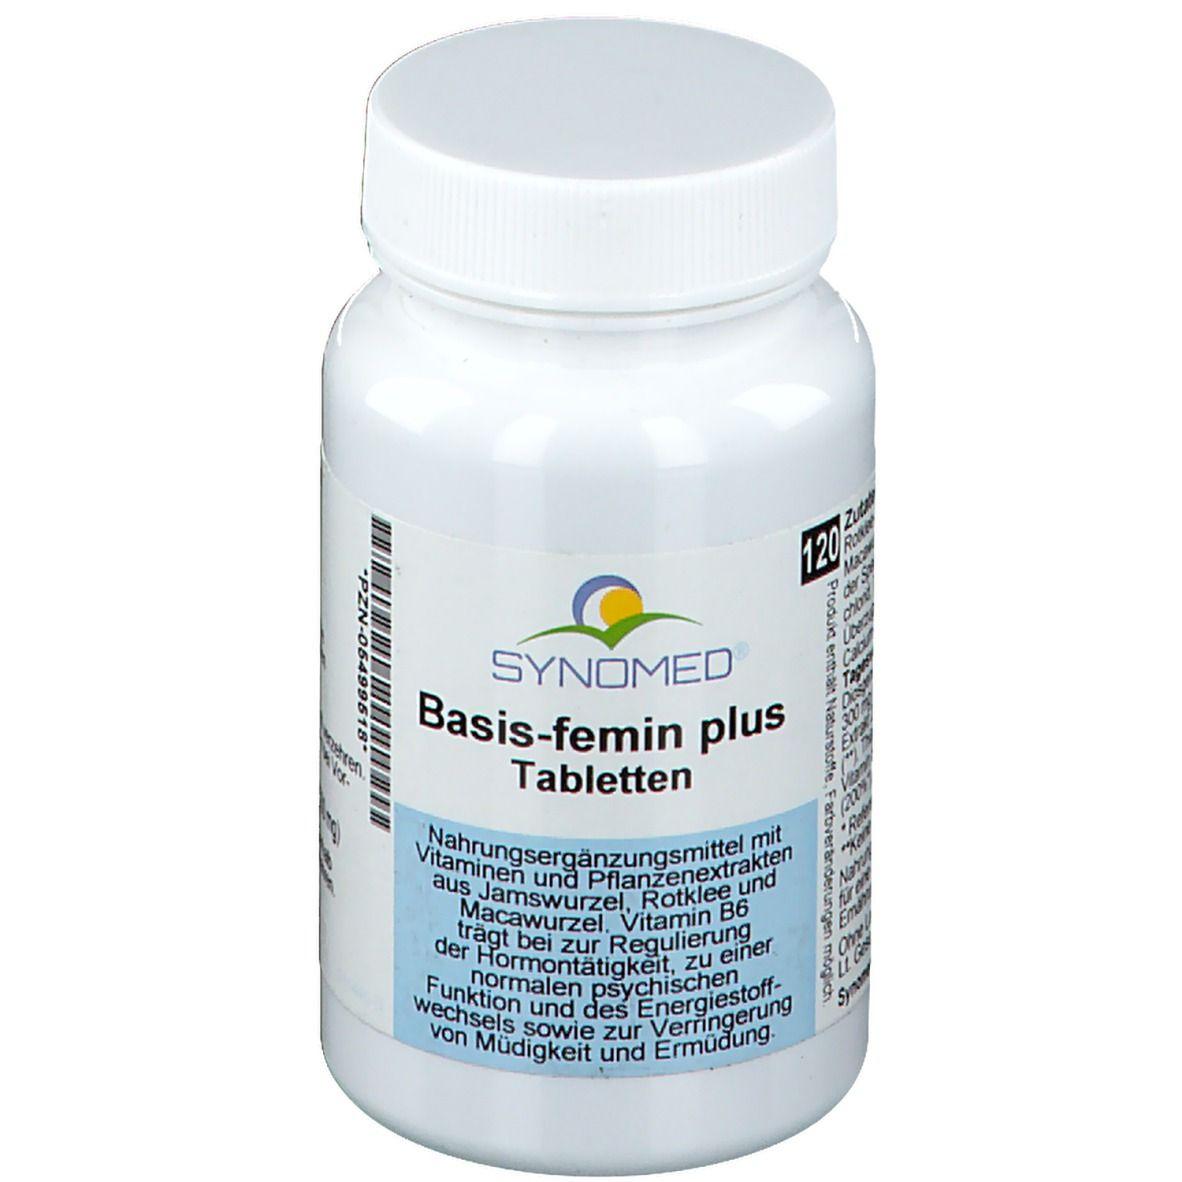 SYNOMED Basis-femin plus